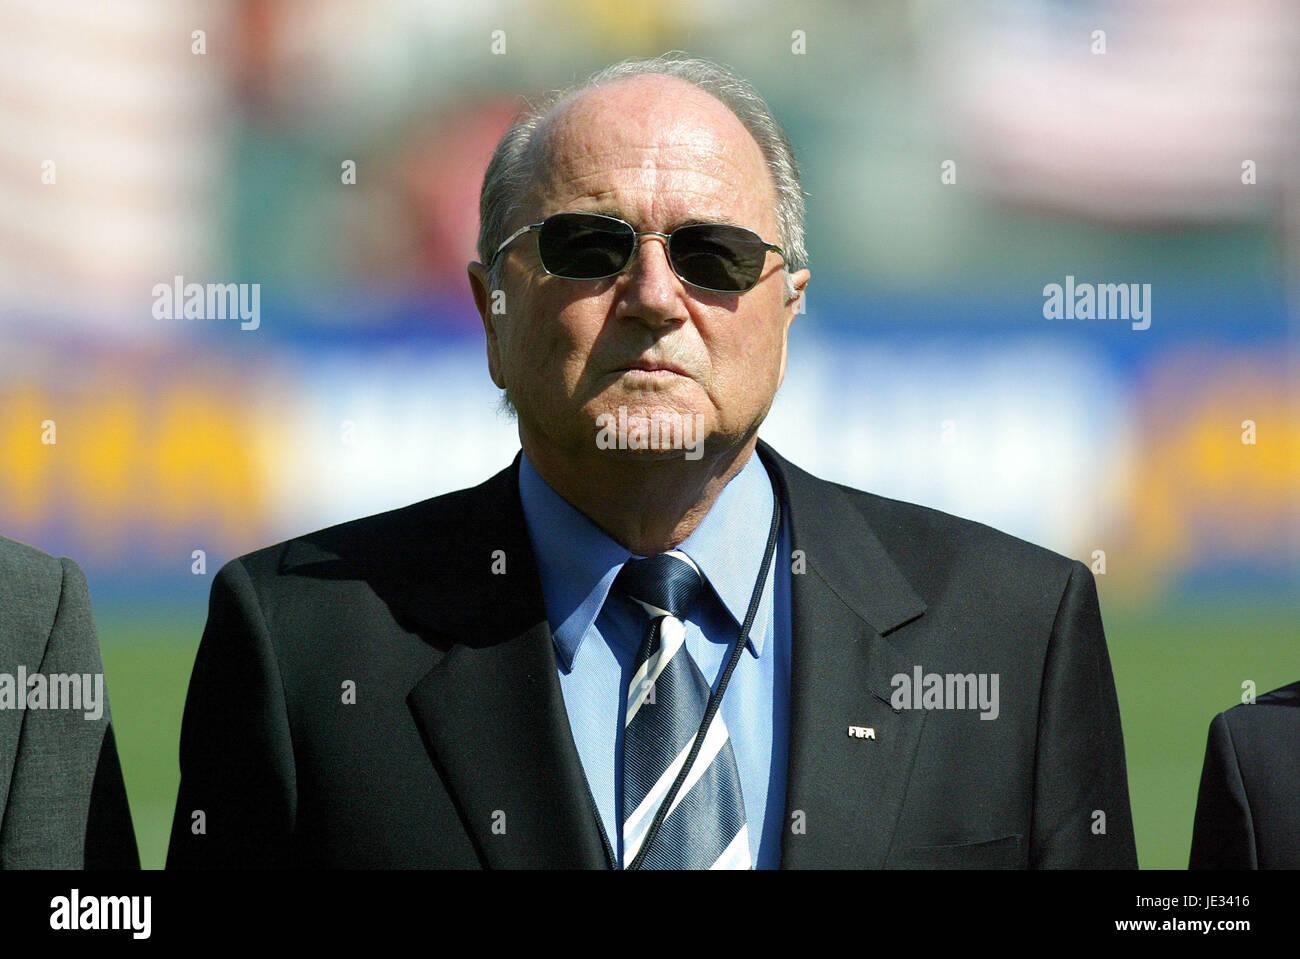 SEPP BLATTER FIFA PRESIDENT CARSON LOS ANGELES USA 11 October 2003 - Stock Image